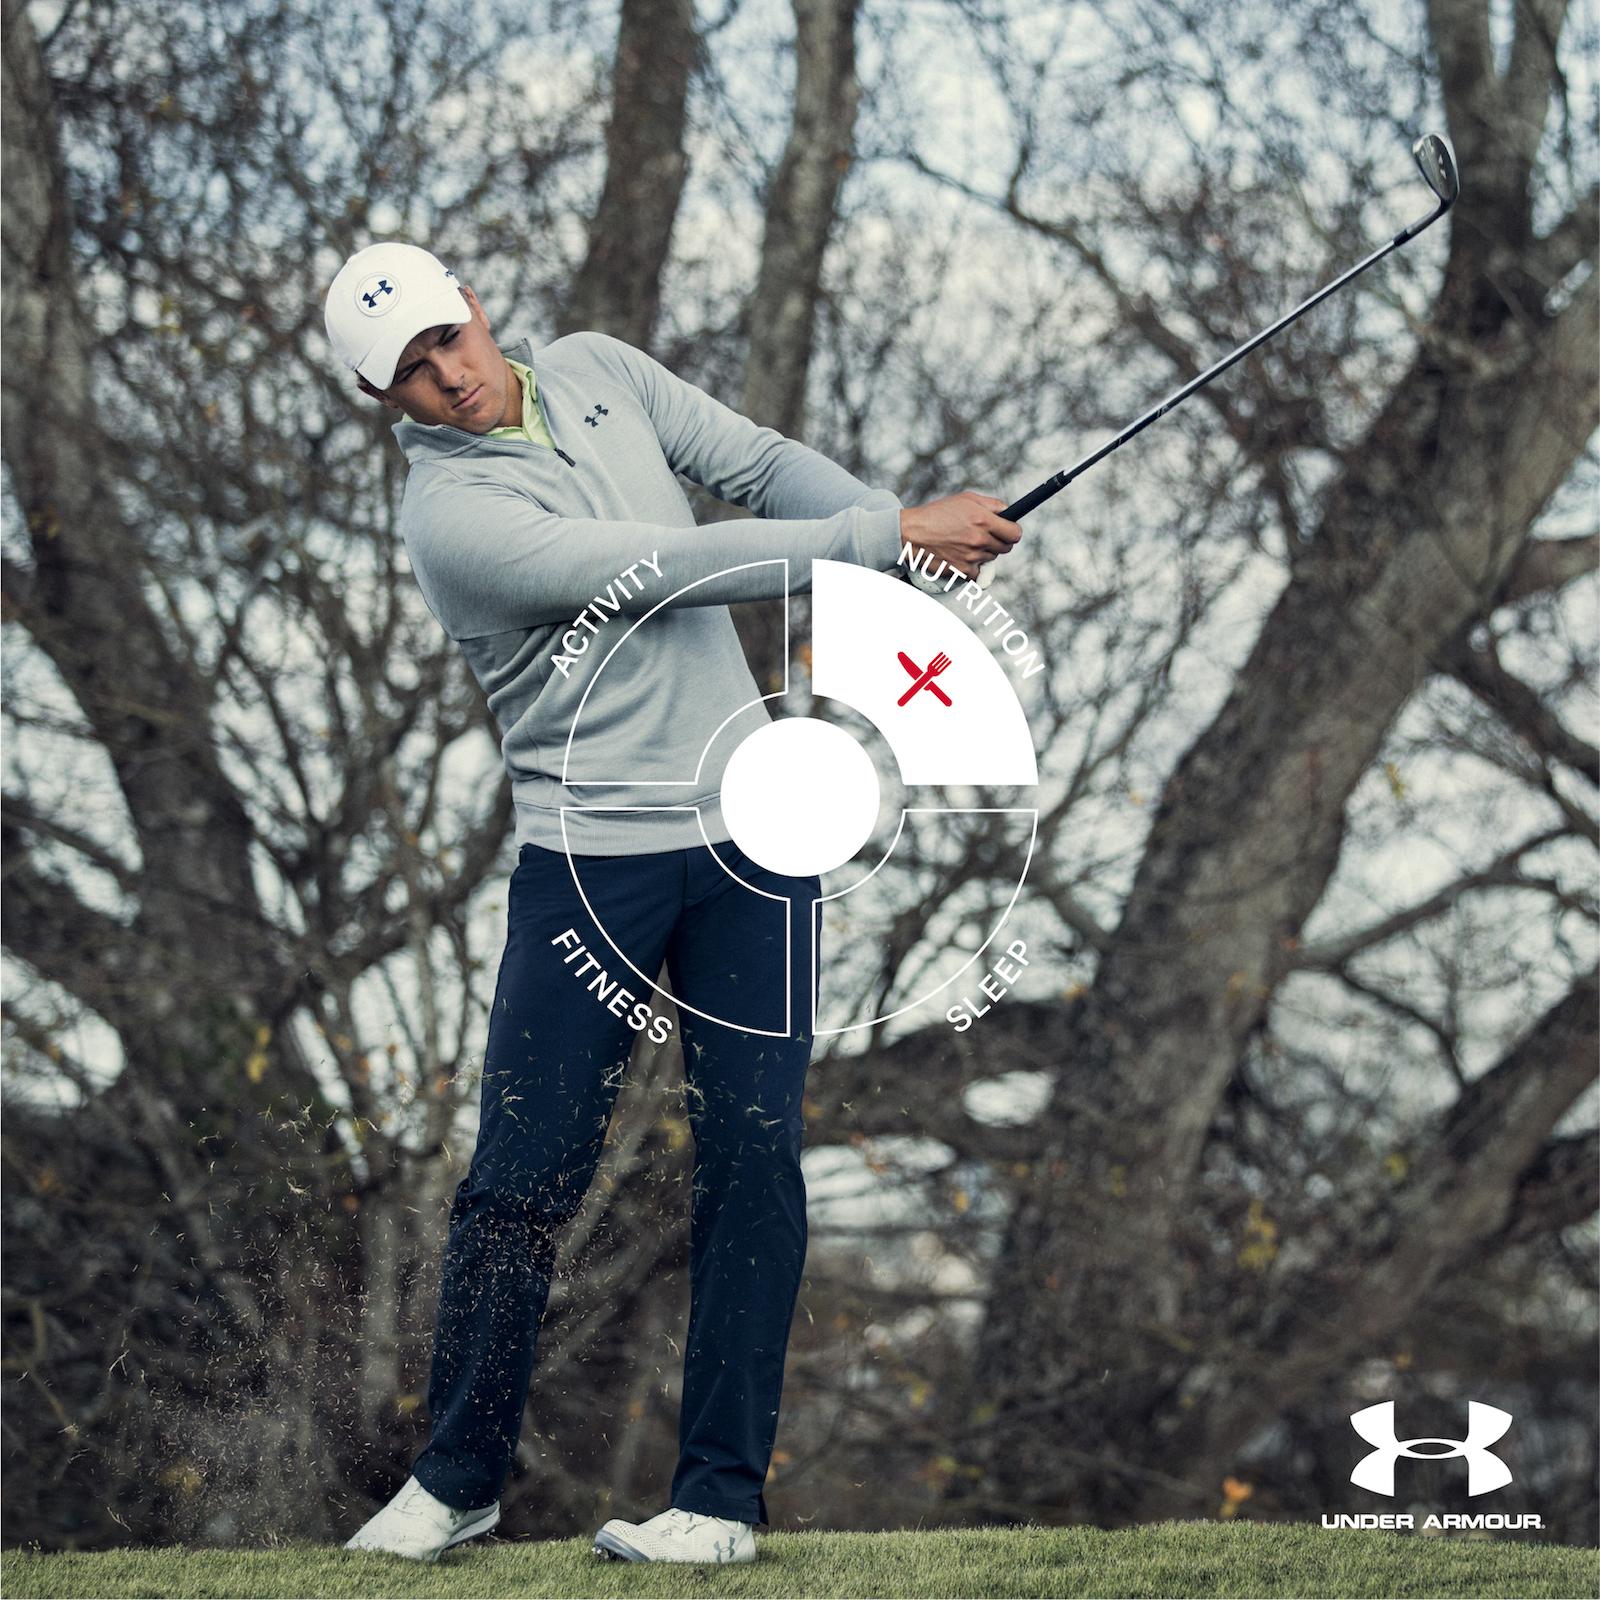 under armour smart golf shoe 6